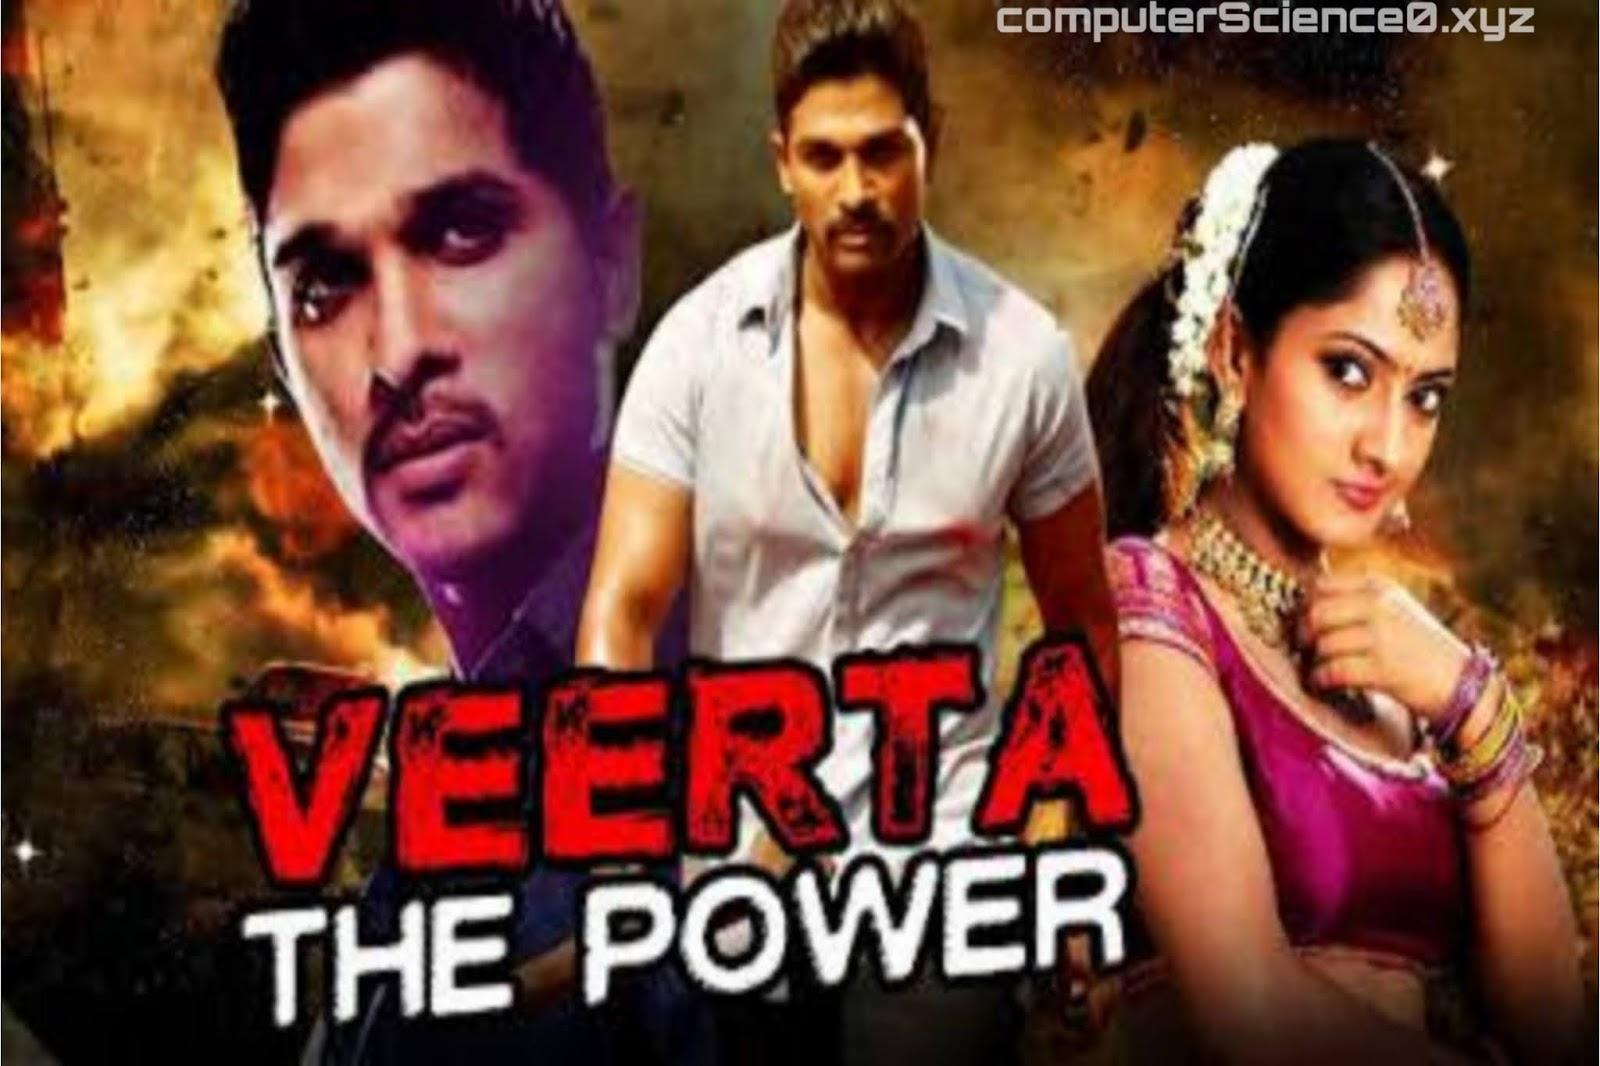 Parugu, Veerta The Power Allu Arjun's Top 19 movies of all time